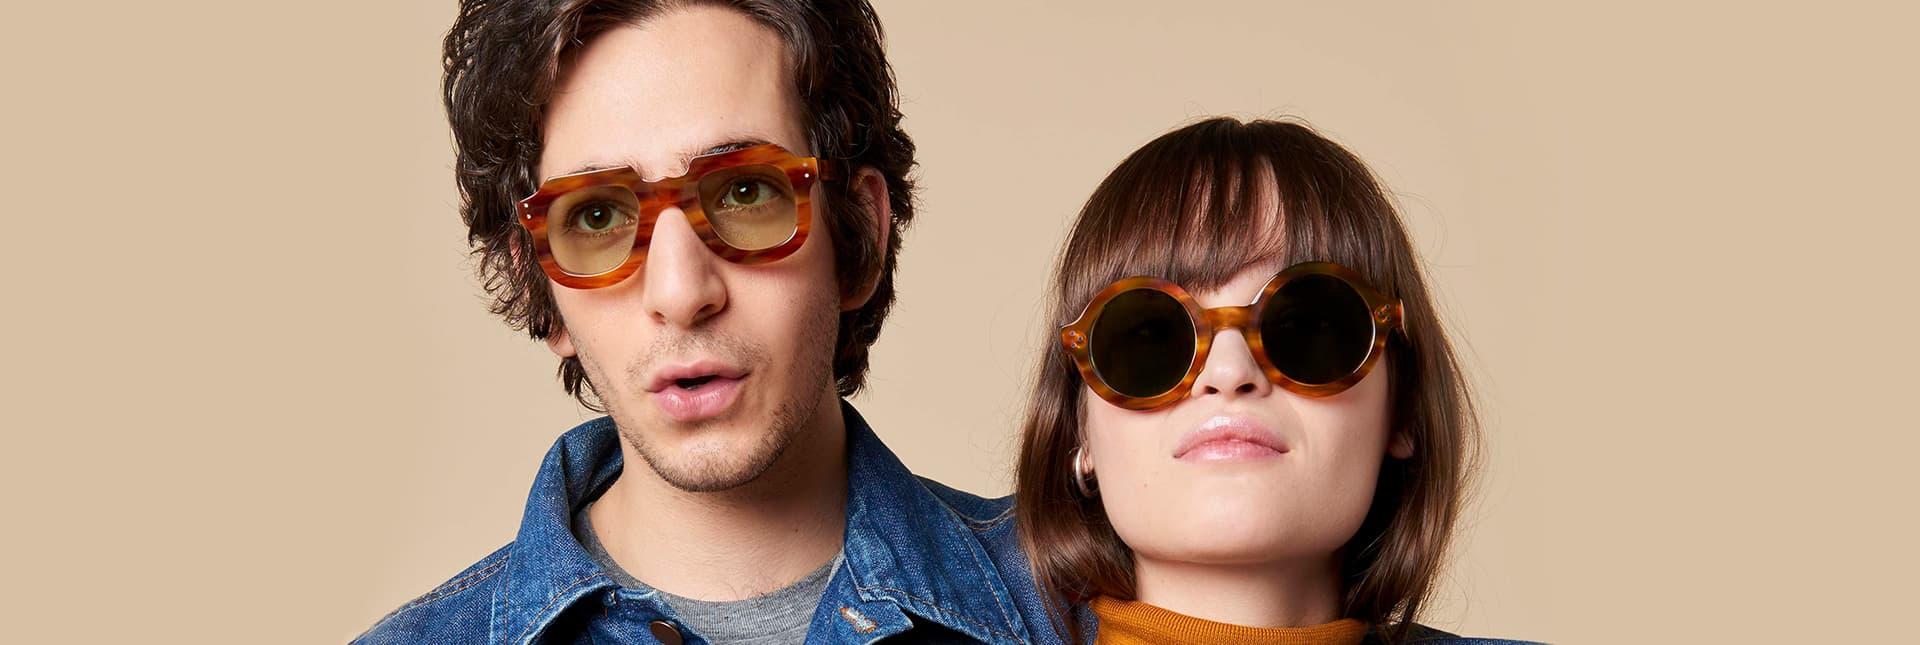 Lesca® Sunglasses